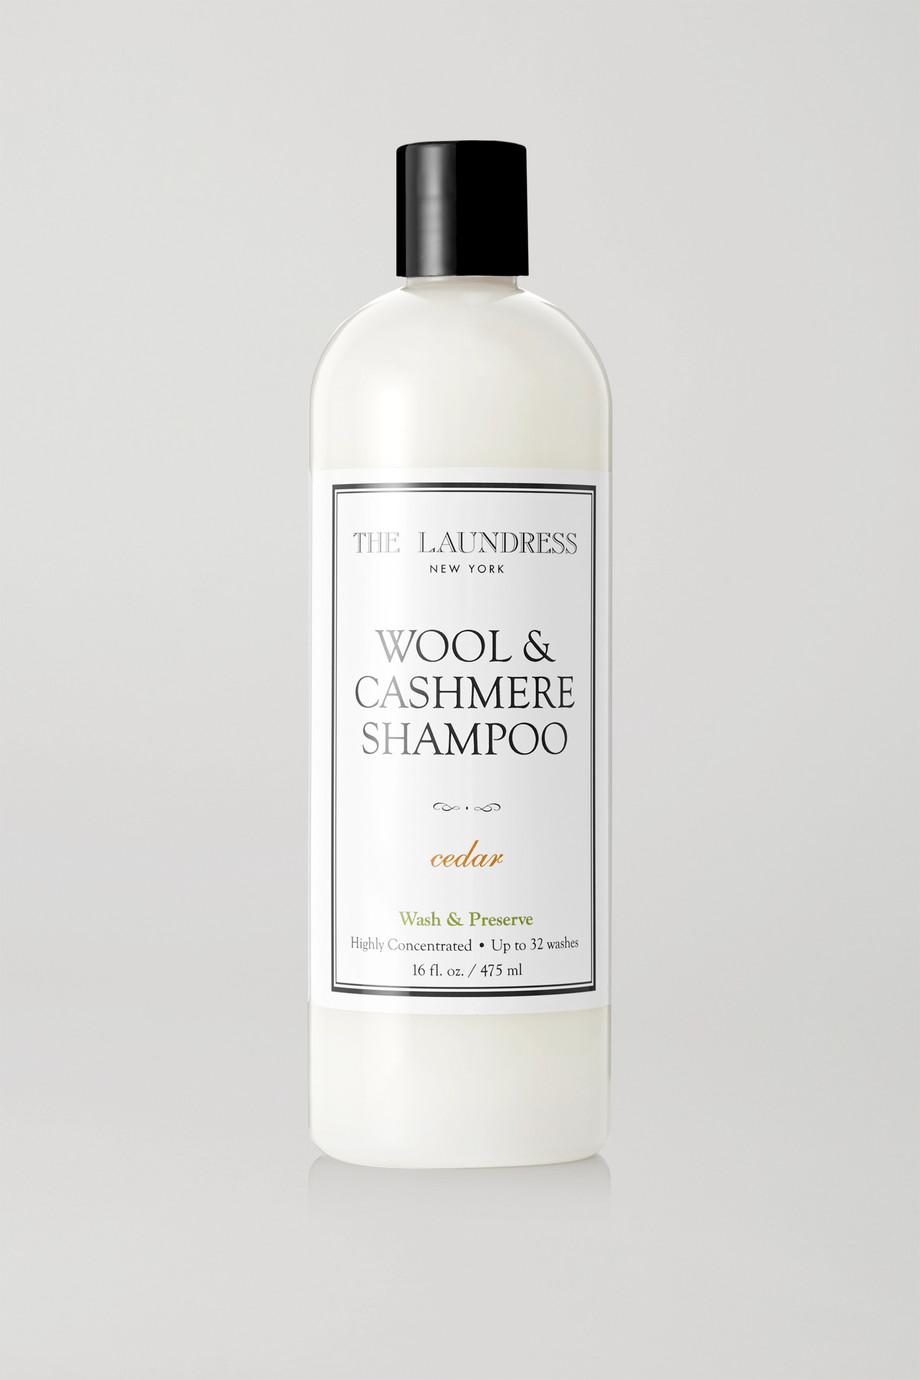 The Laundress Wool & Cashmere Shampoo - Cedar, 475ml